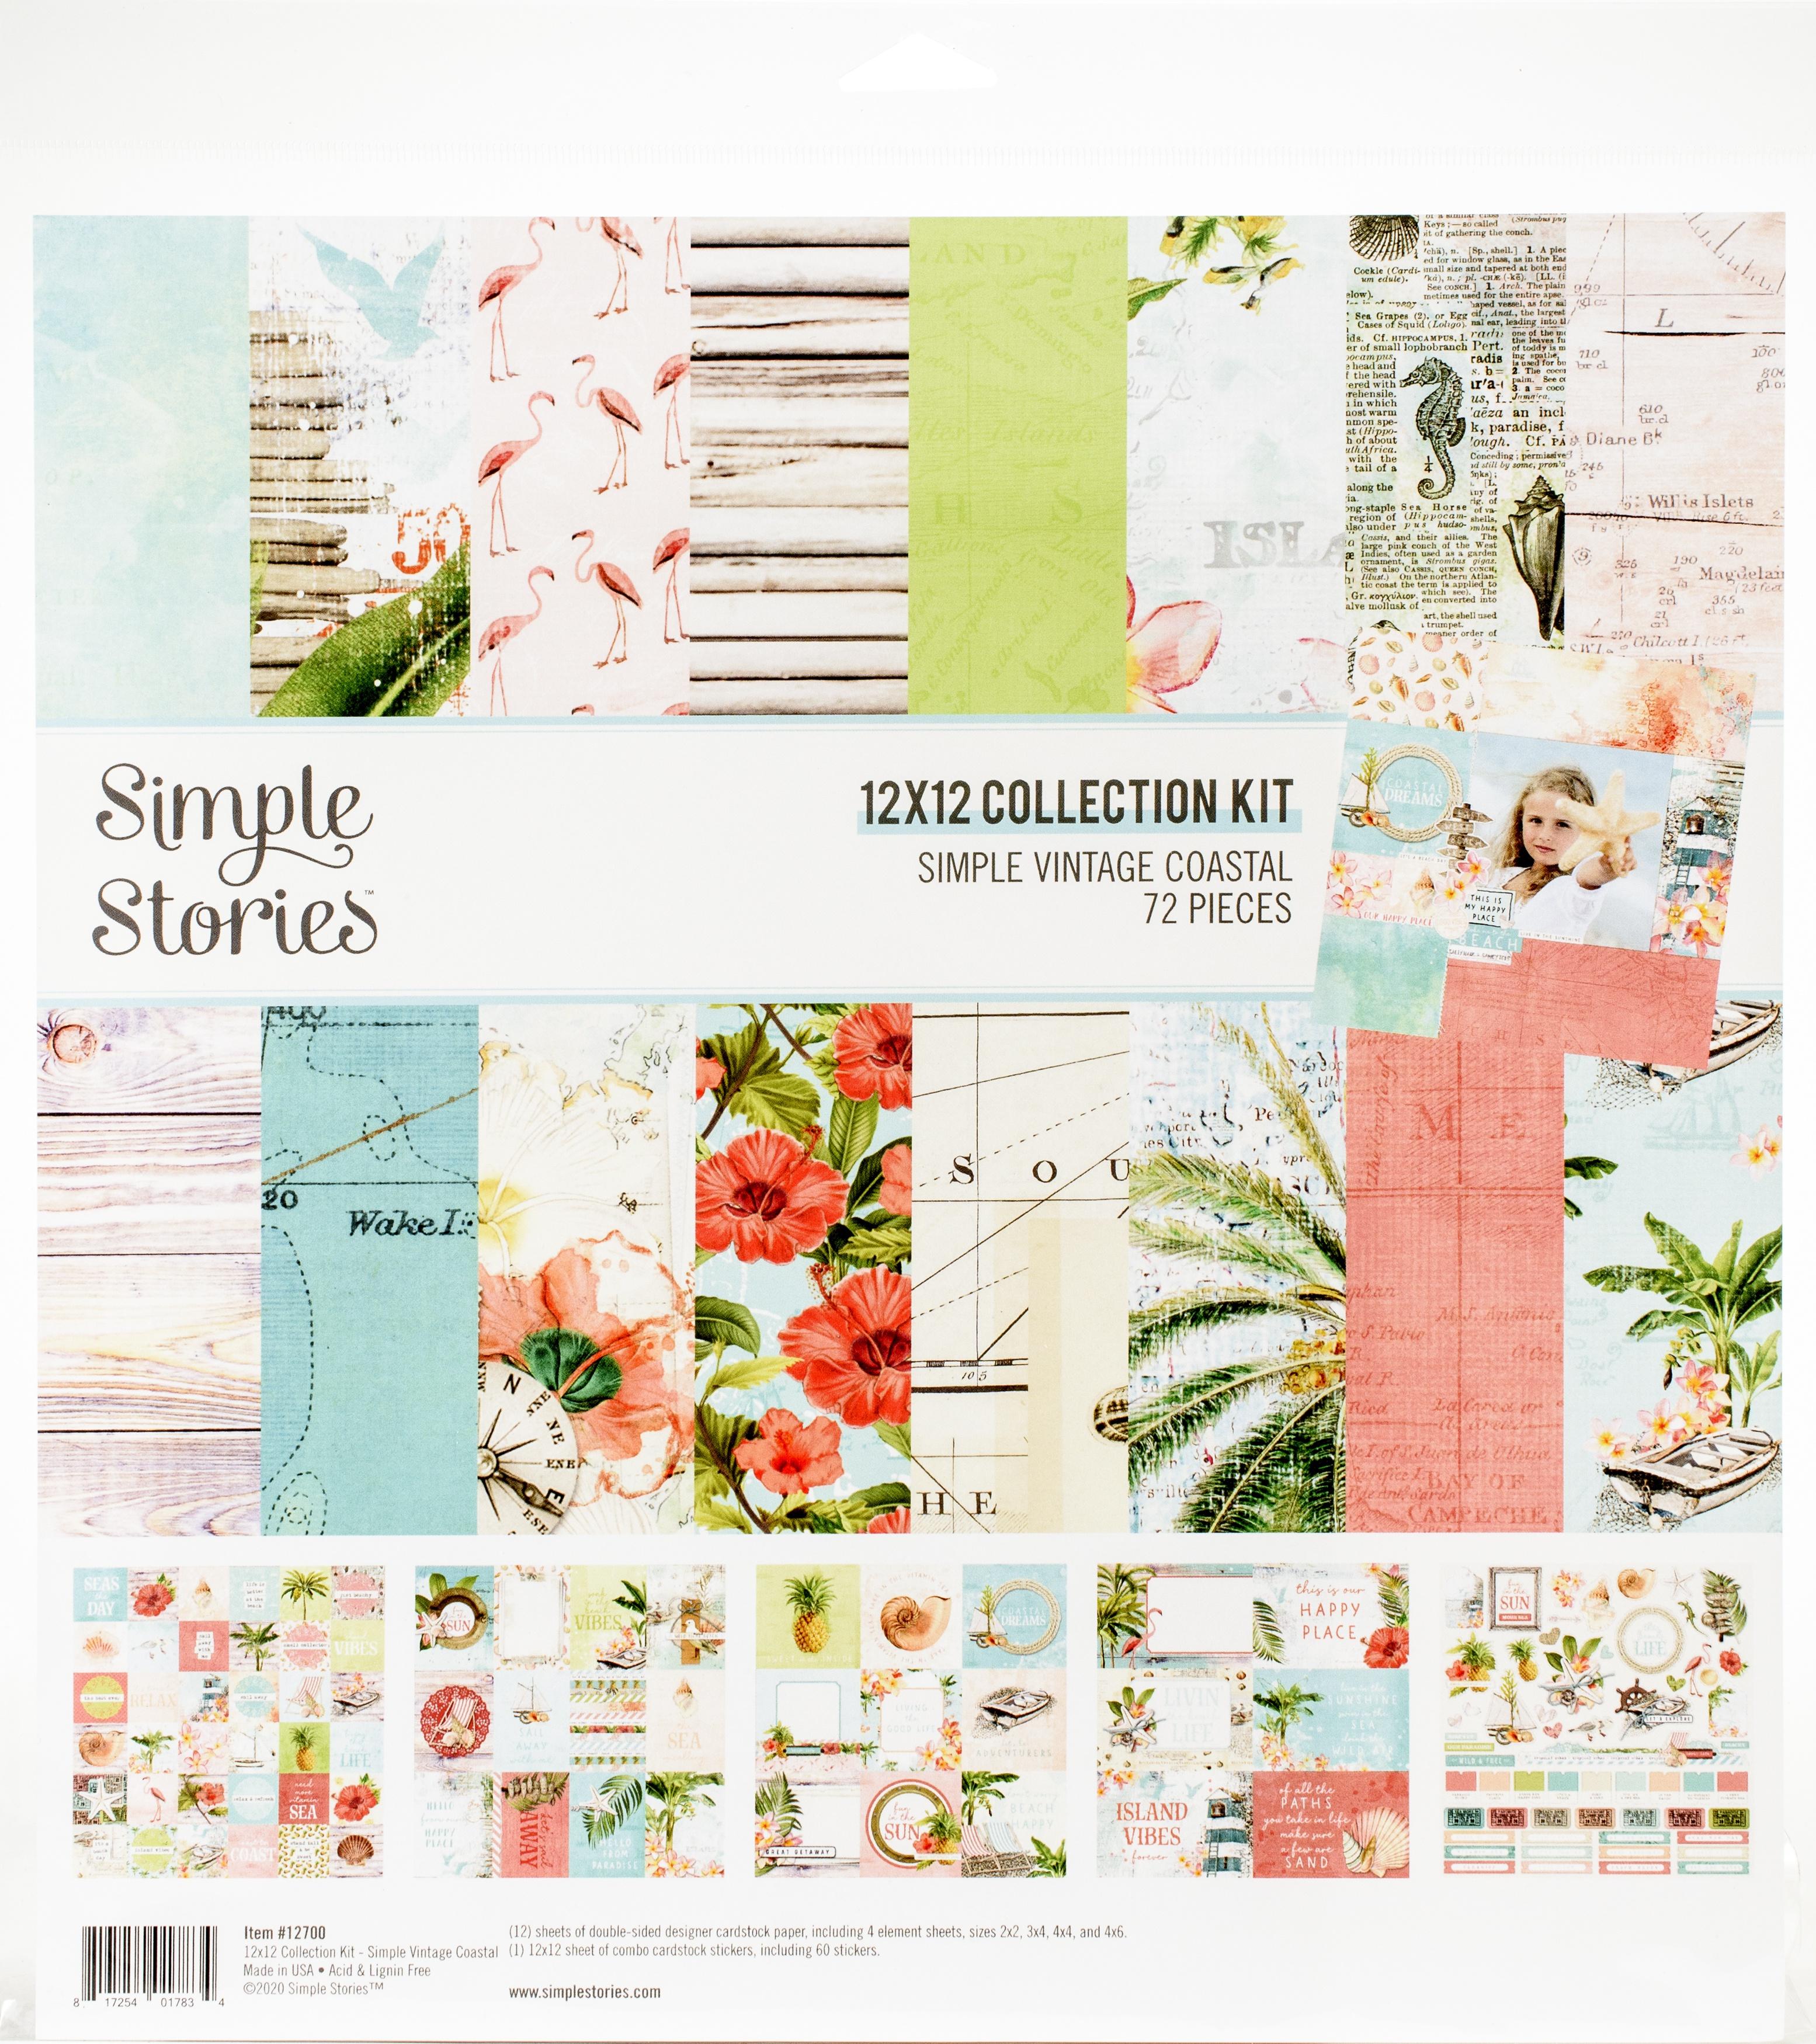 Simple Stories Collection Kit 12X12-Simple Vintage Coastal